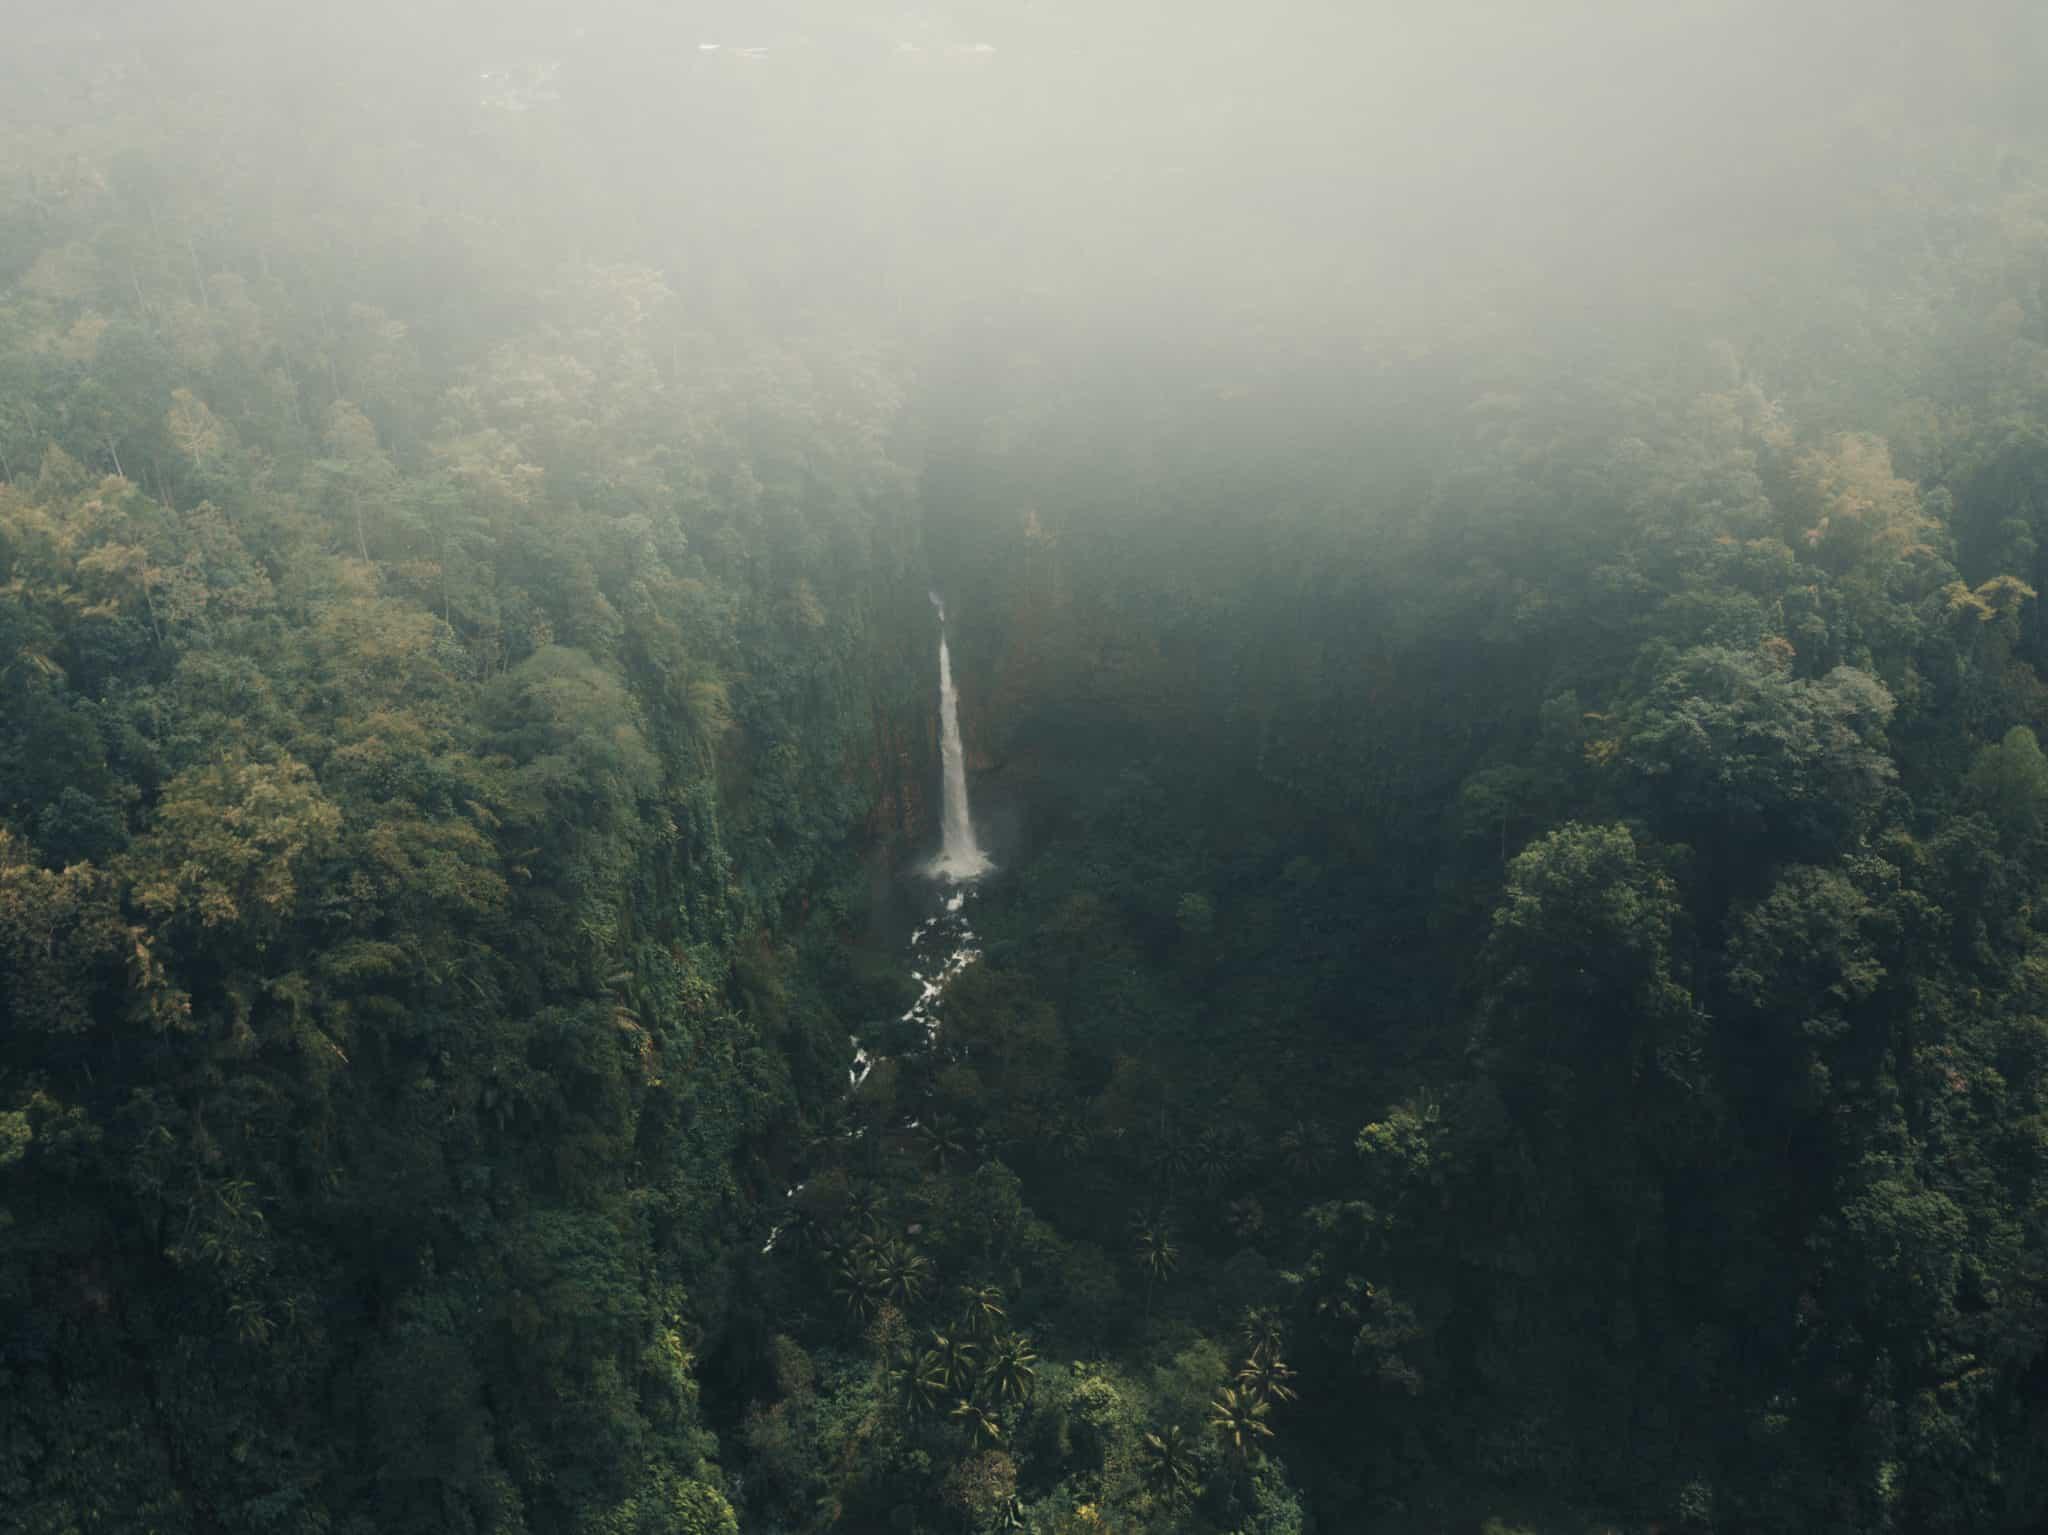 Kapa Biru From Above - East Java Waterfall by @Joeadimara_